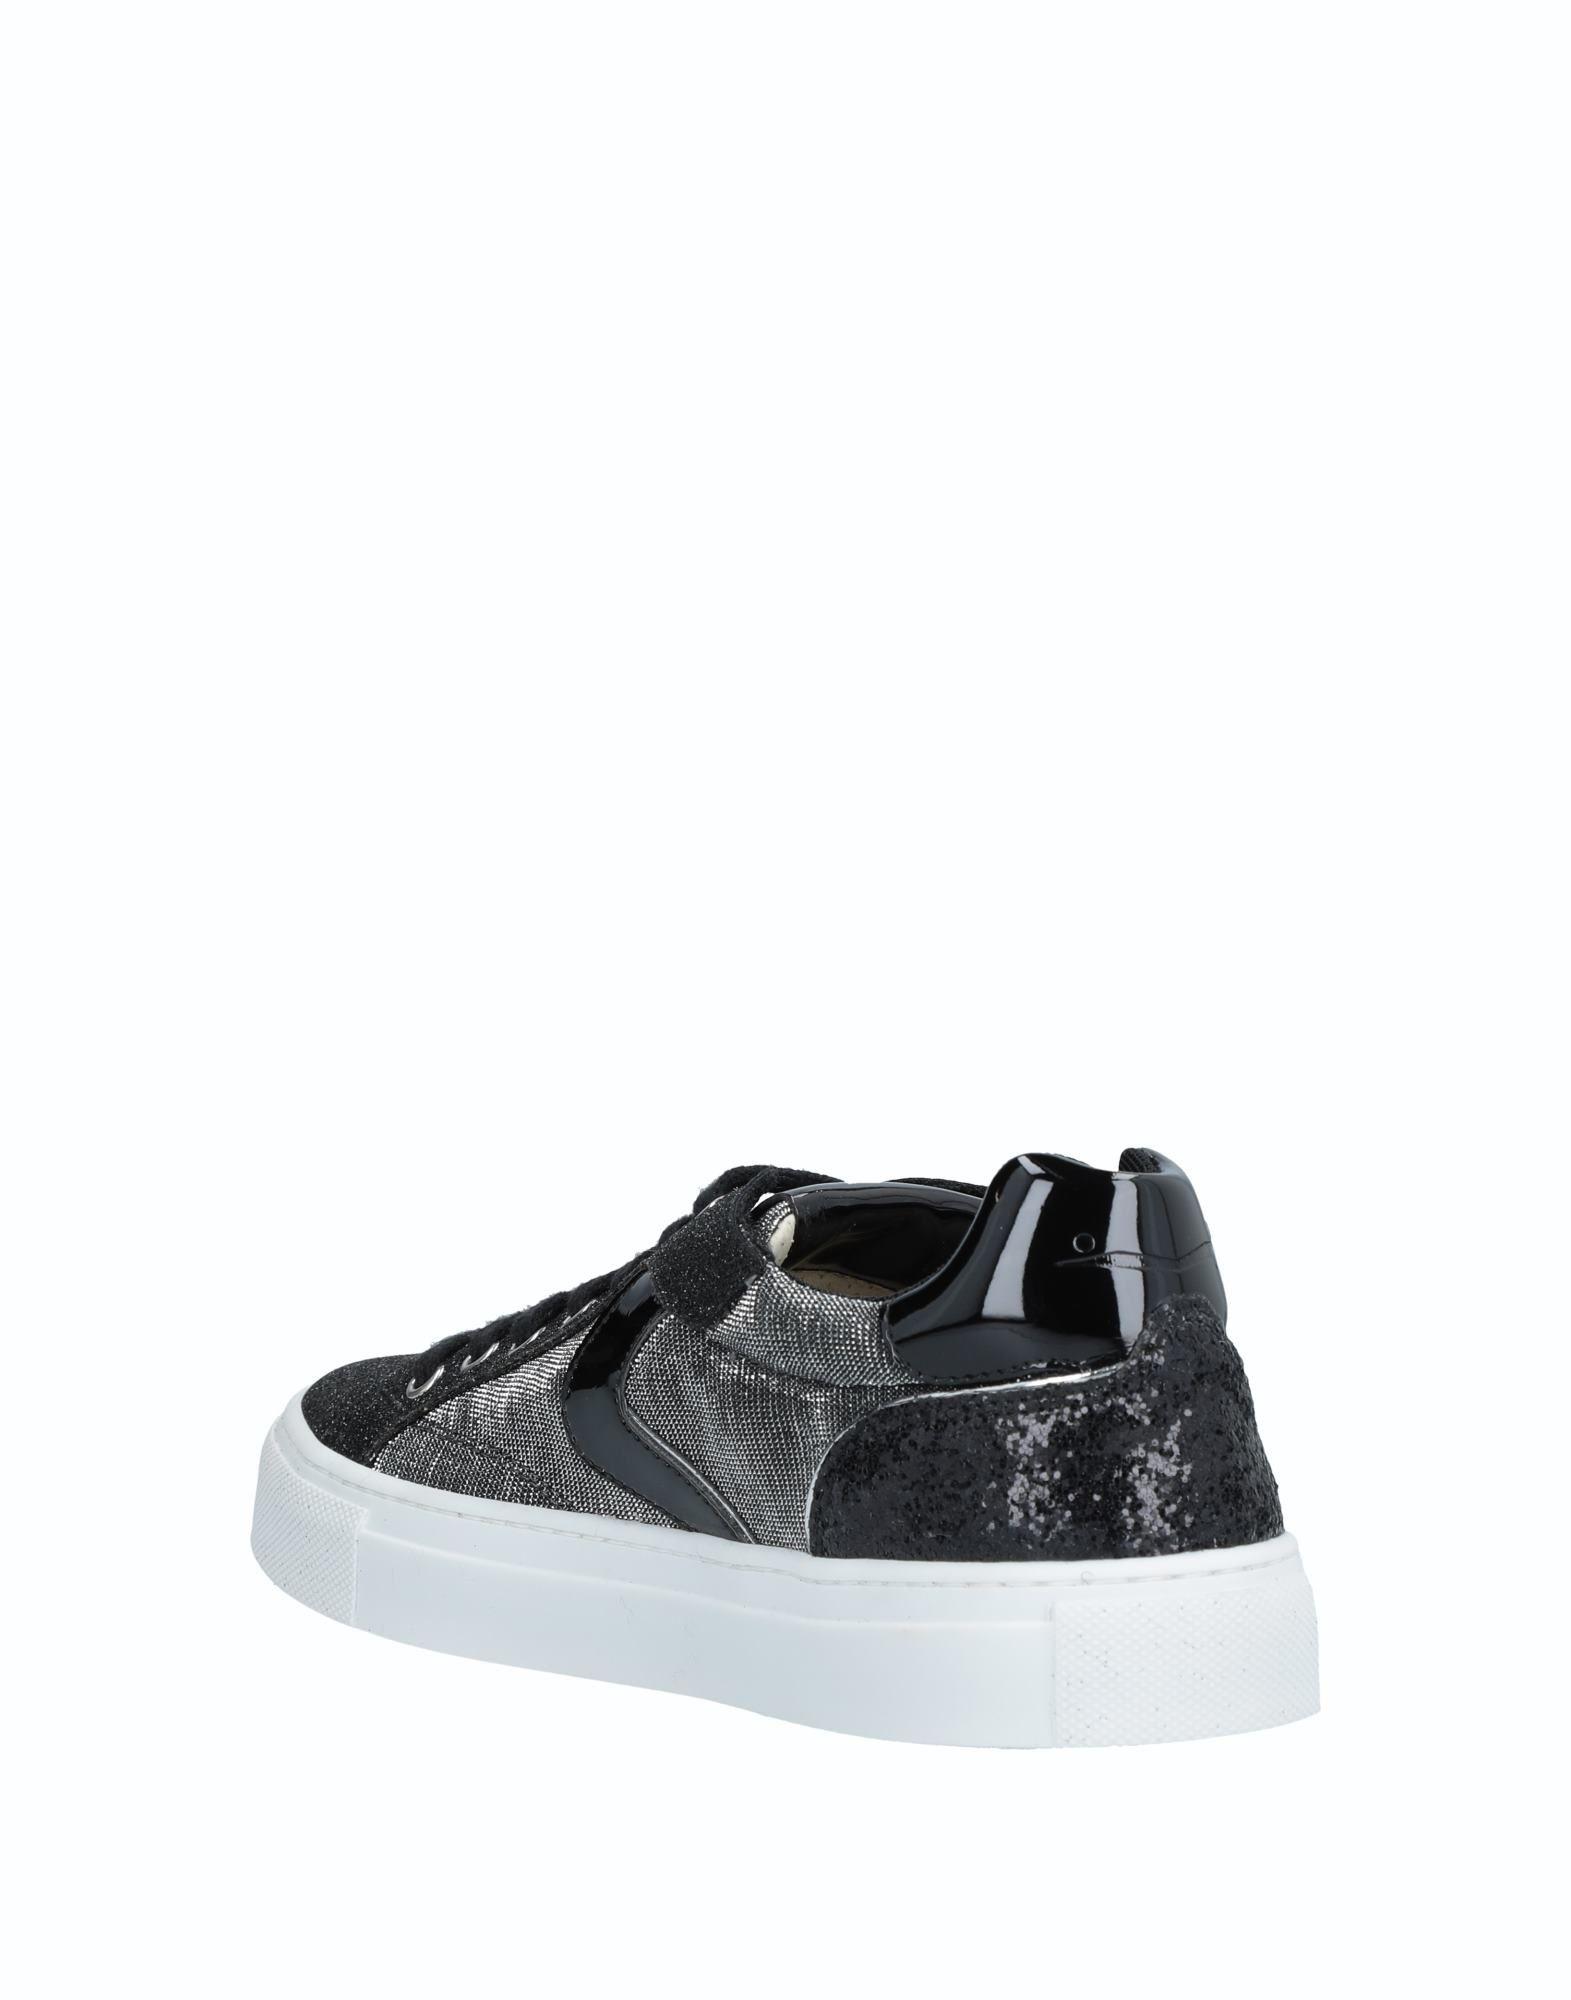 Gut um billige Sneakers Schuhe zu tragenVoile Blanche Sneakers billige Damen  11537274IH ea2855